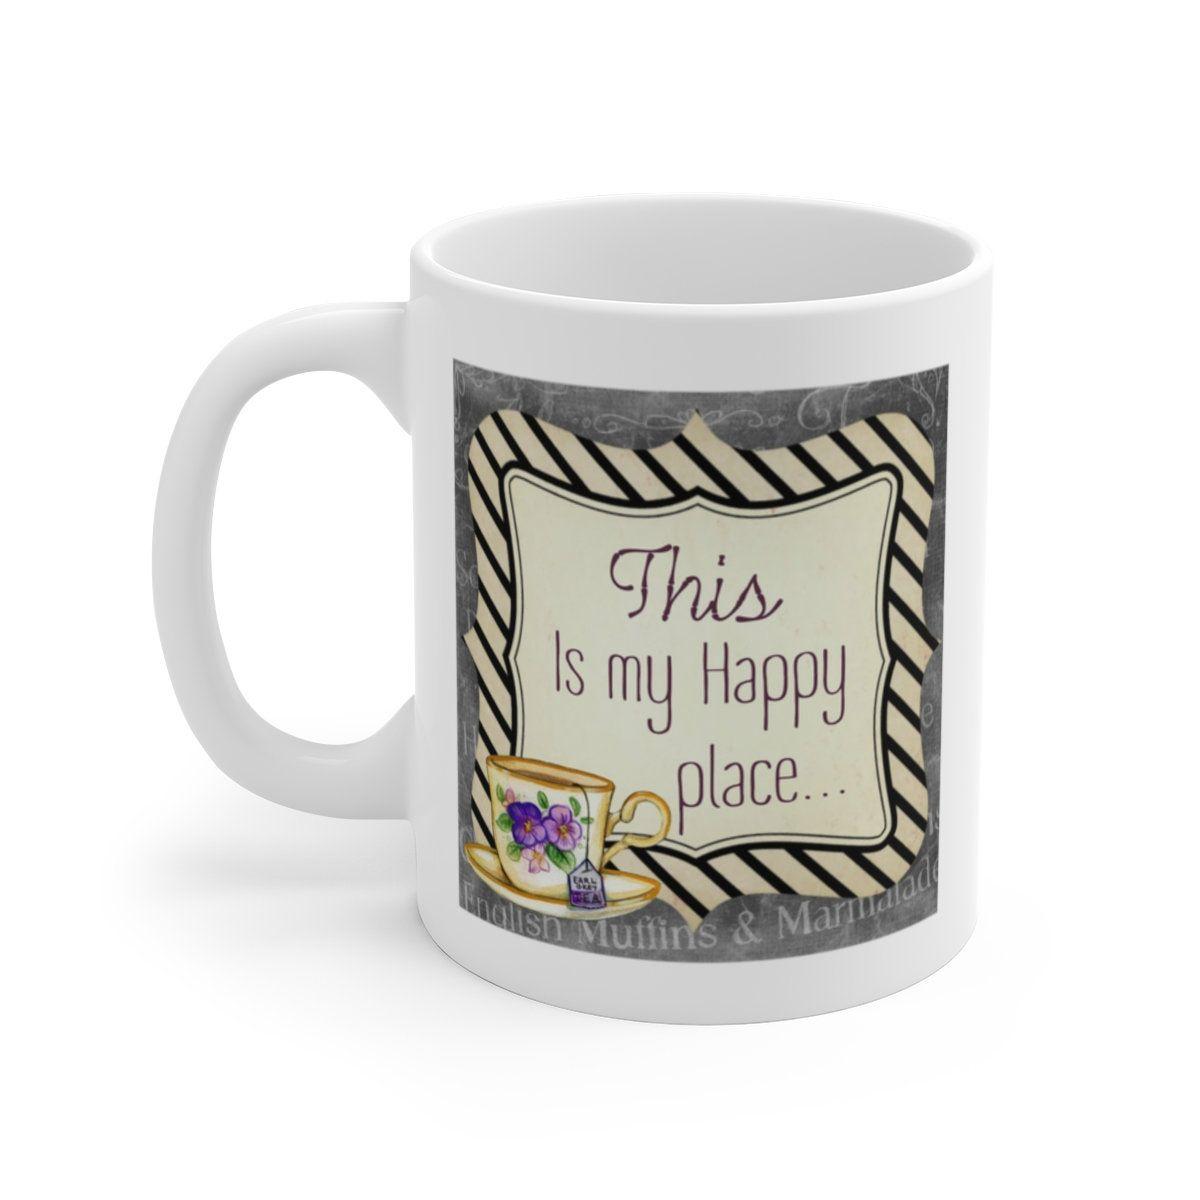 Inspirational Mug Motivational Mug Statement Mug Motivational